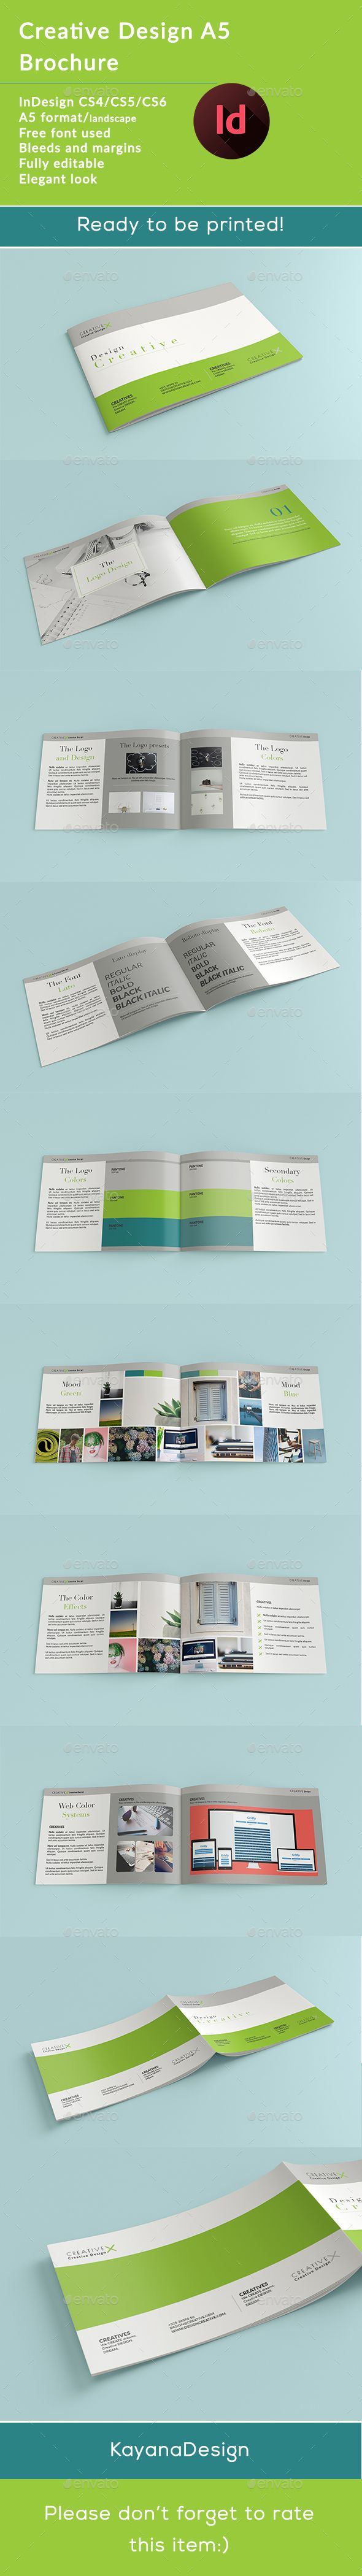 Creative Design X A Horizontal Brochure Brochures Print - Horizontal brochure template